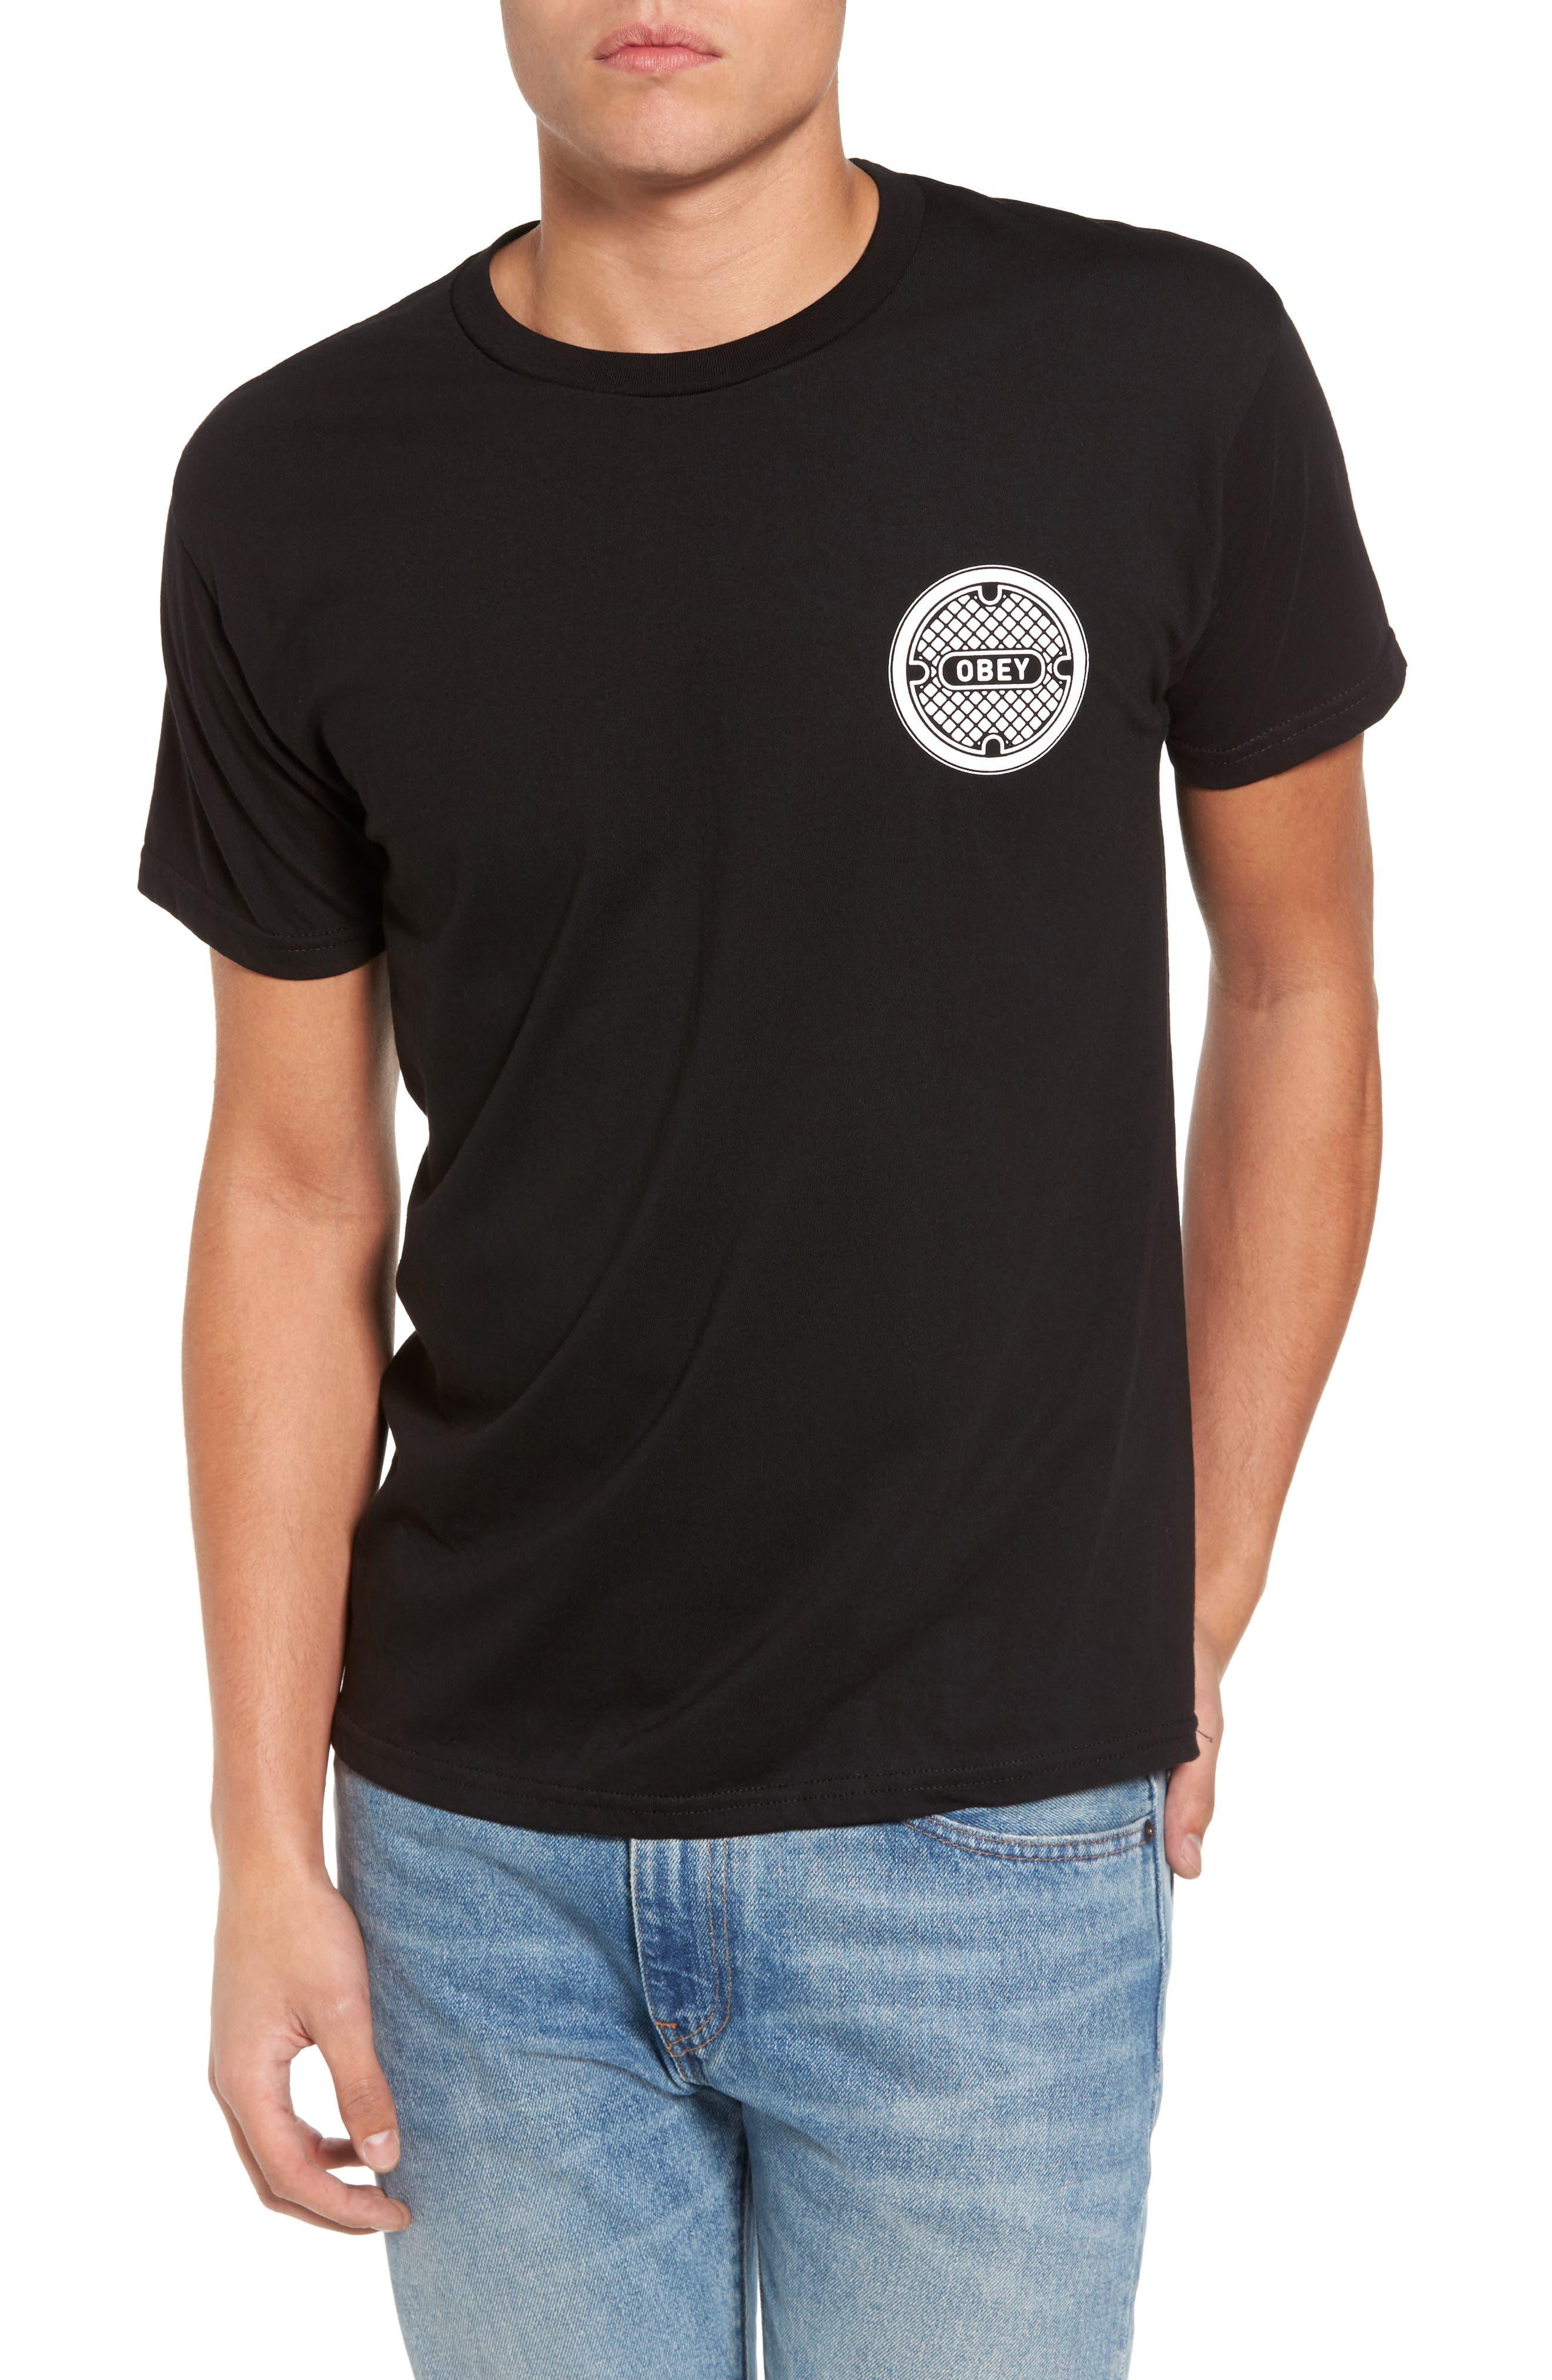 Obey Sewer Creep T-Shirt